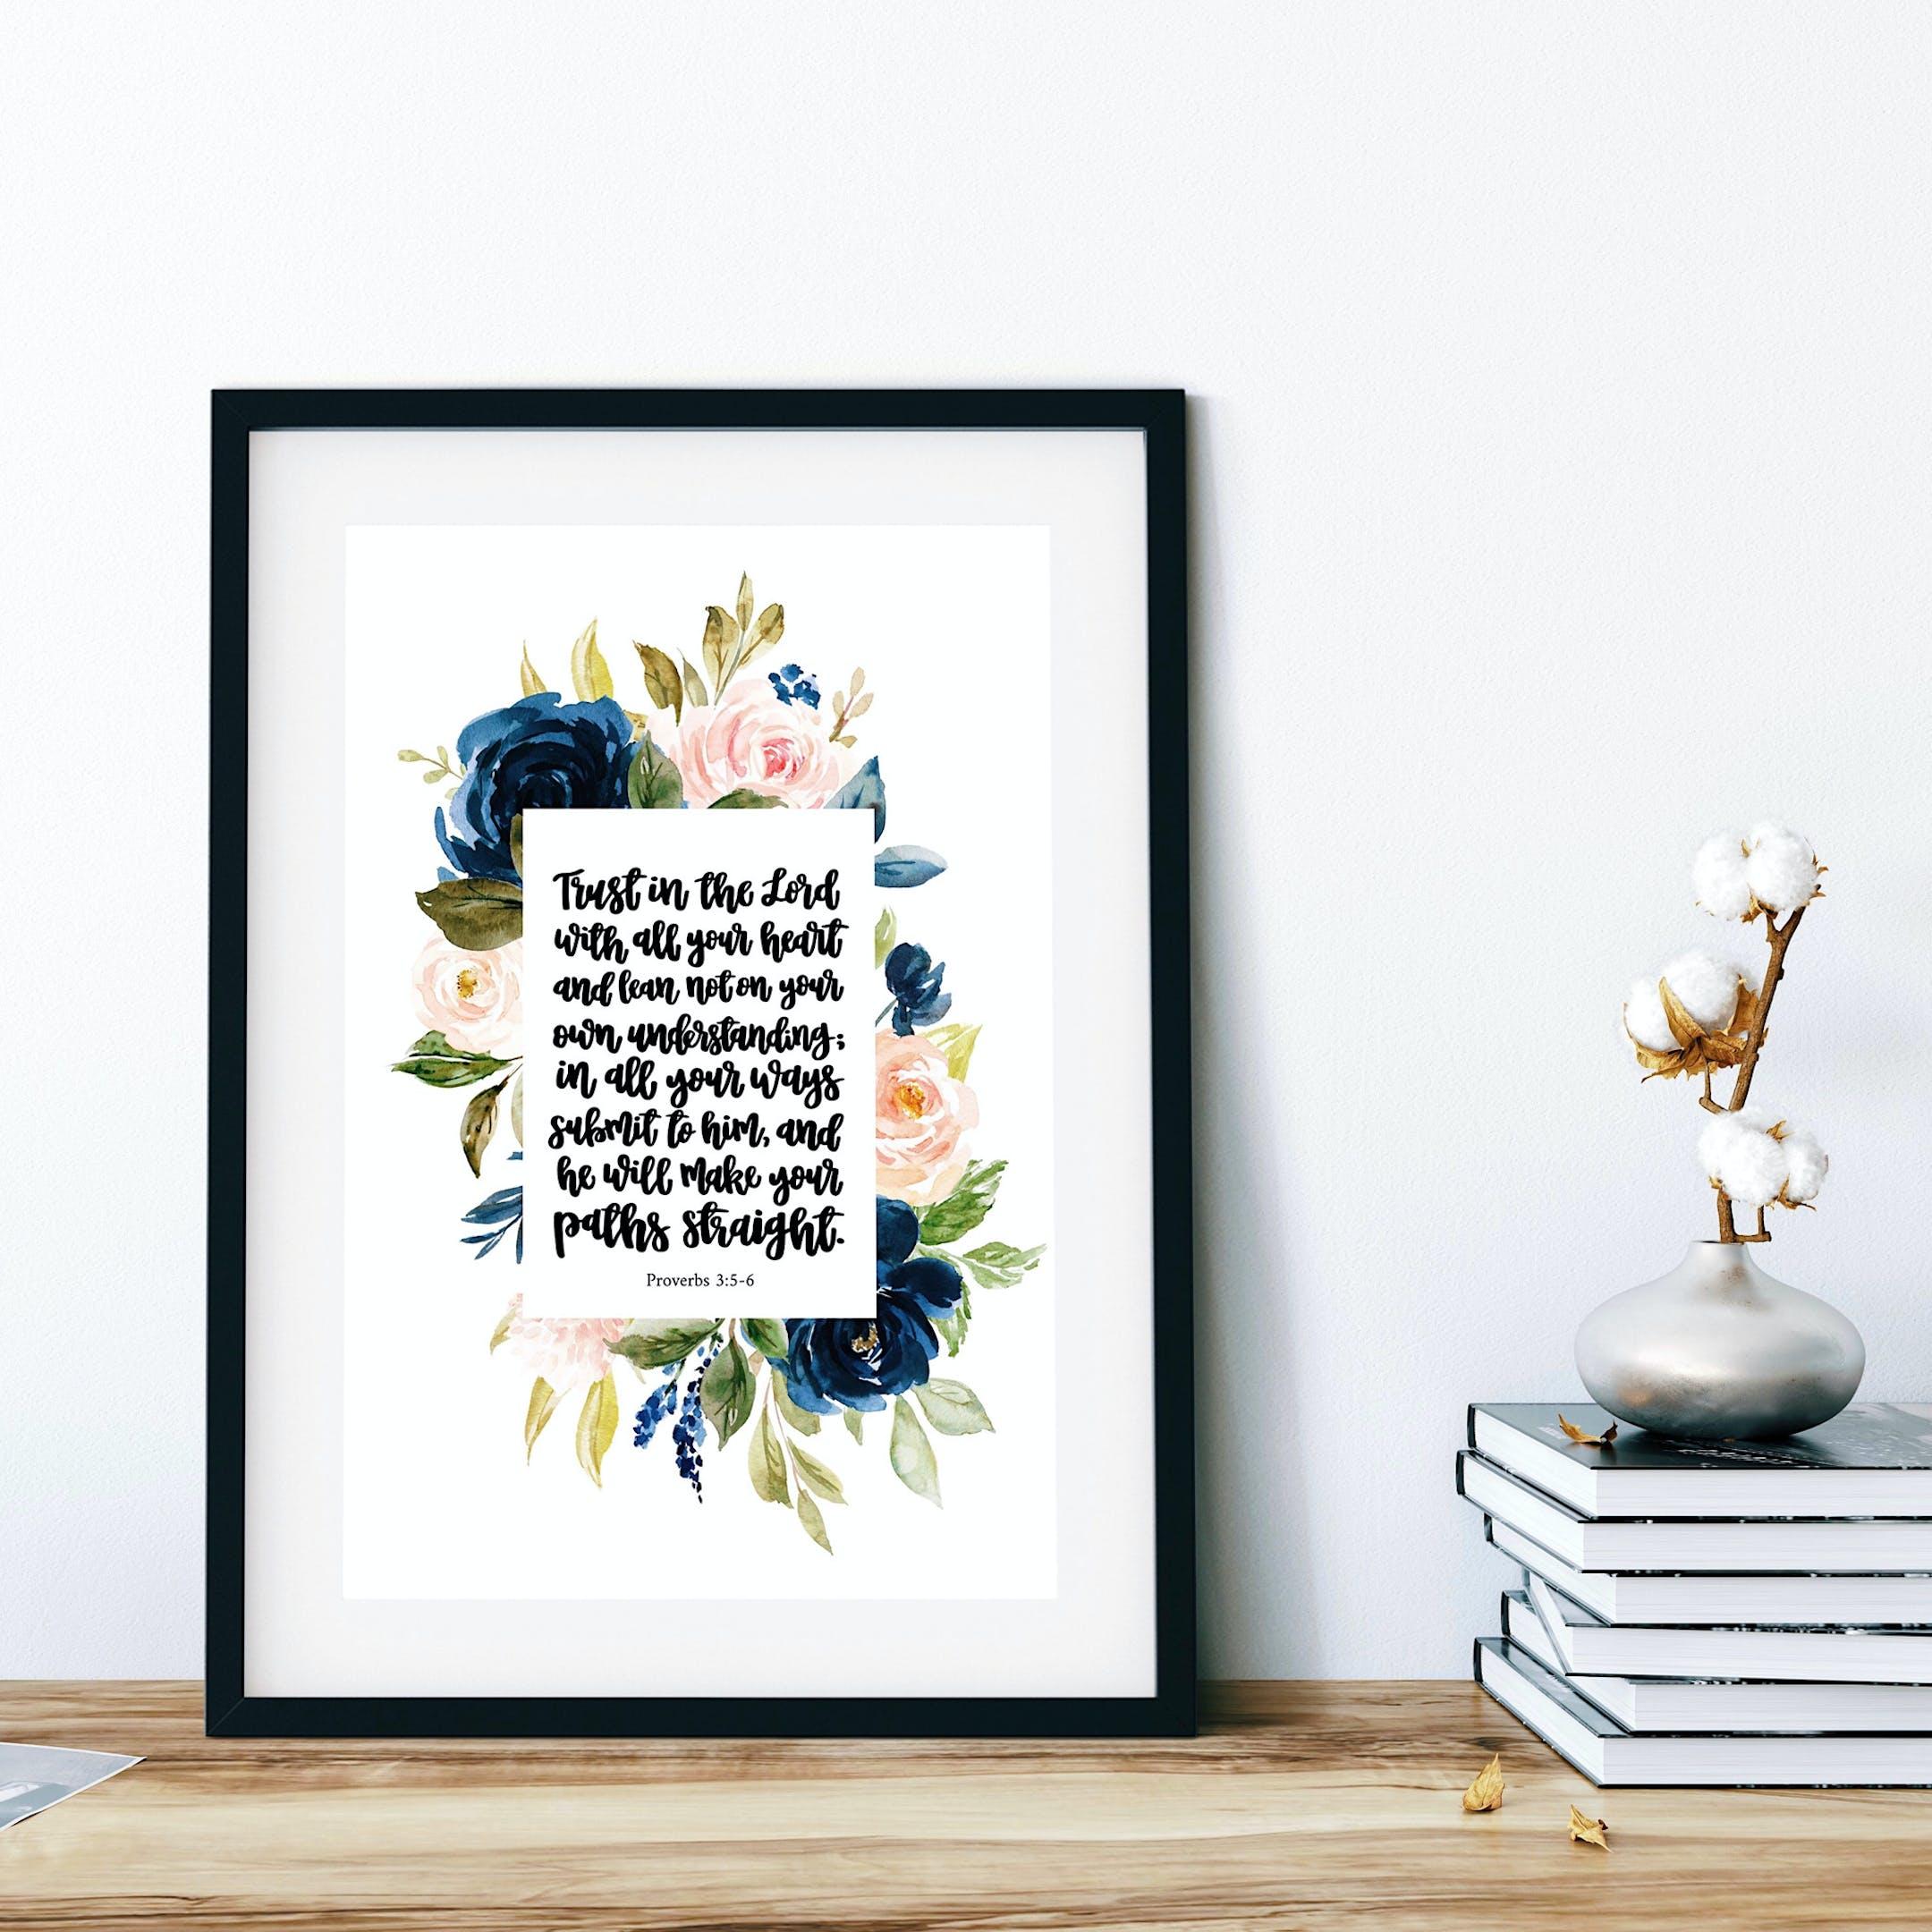 Floral Proverbs 3:5-6 Print - Izzy & Pop